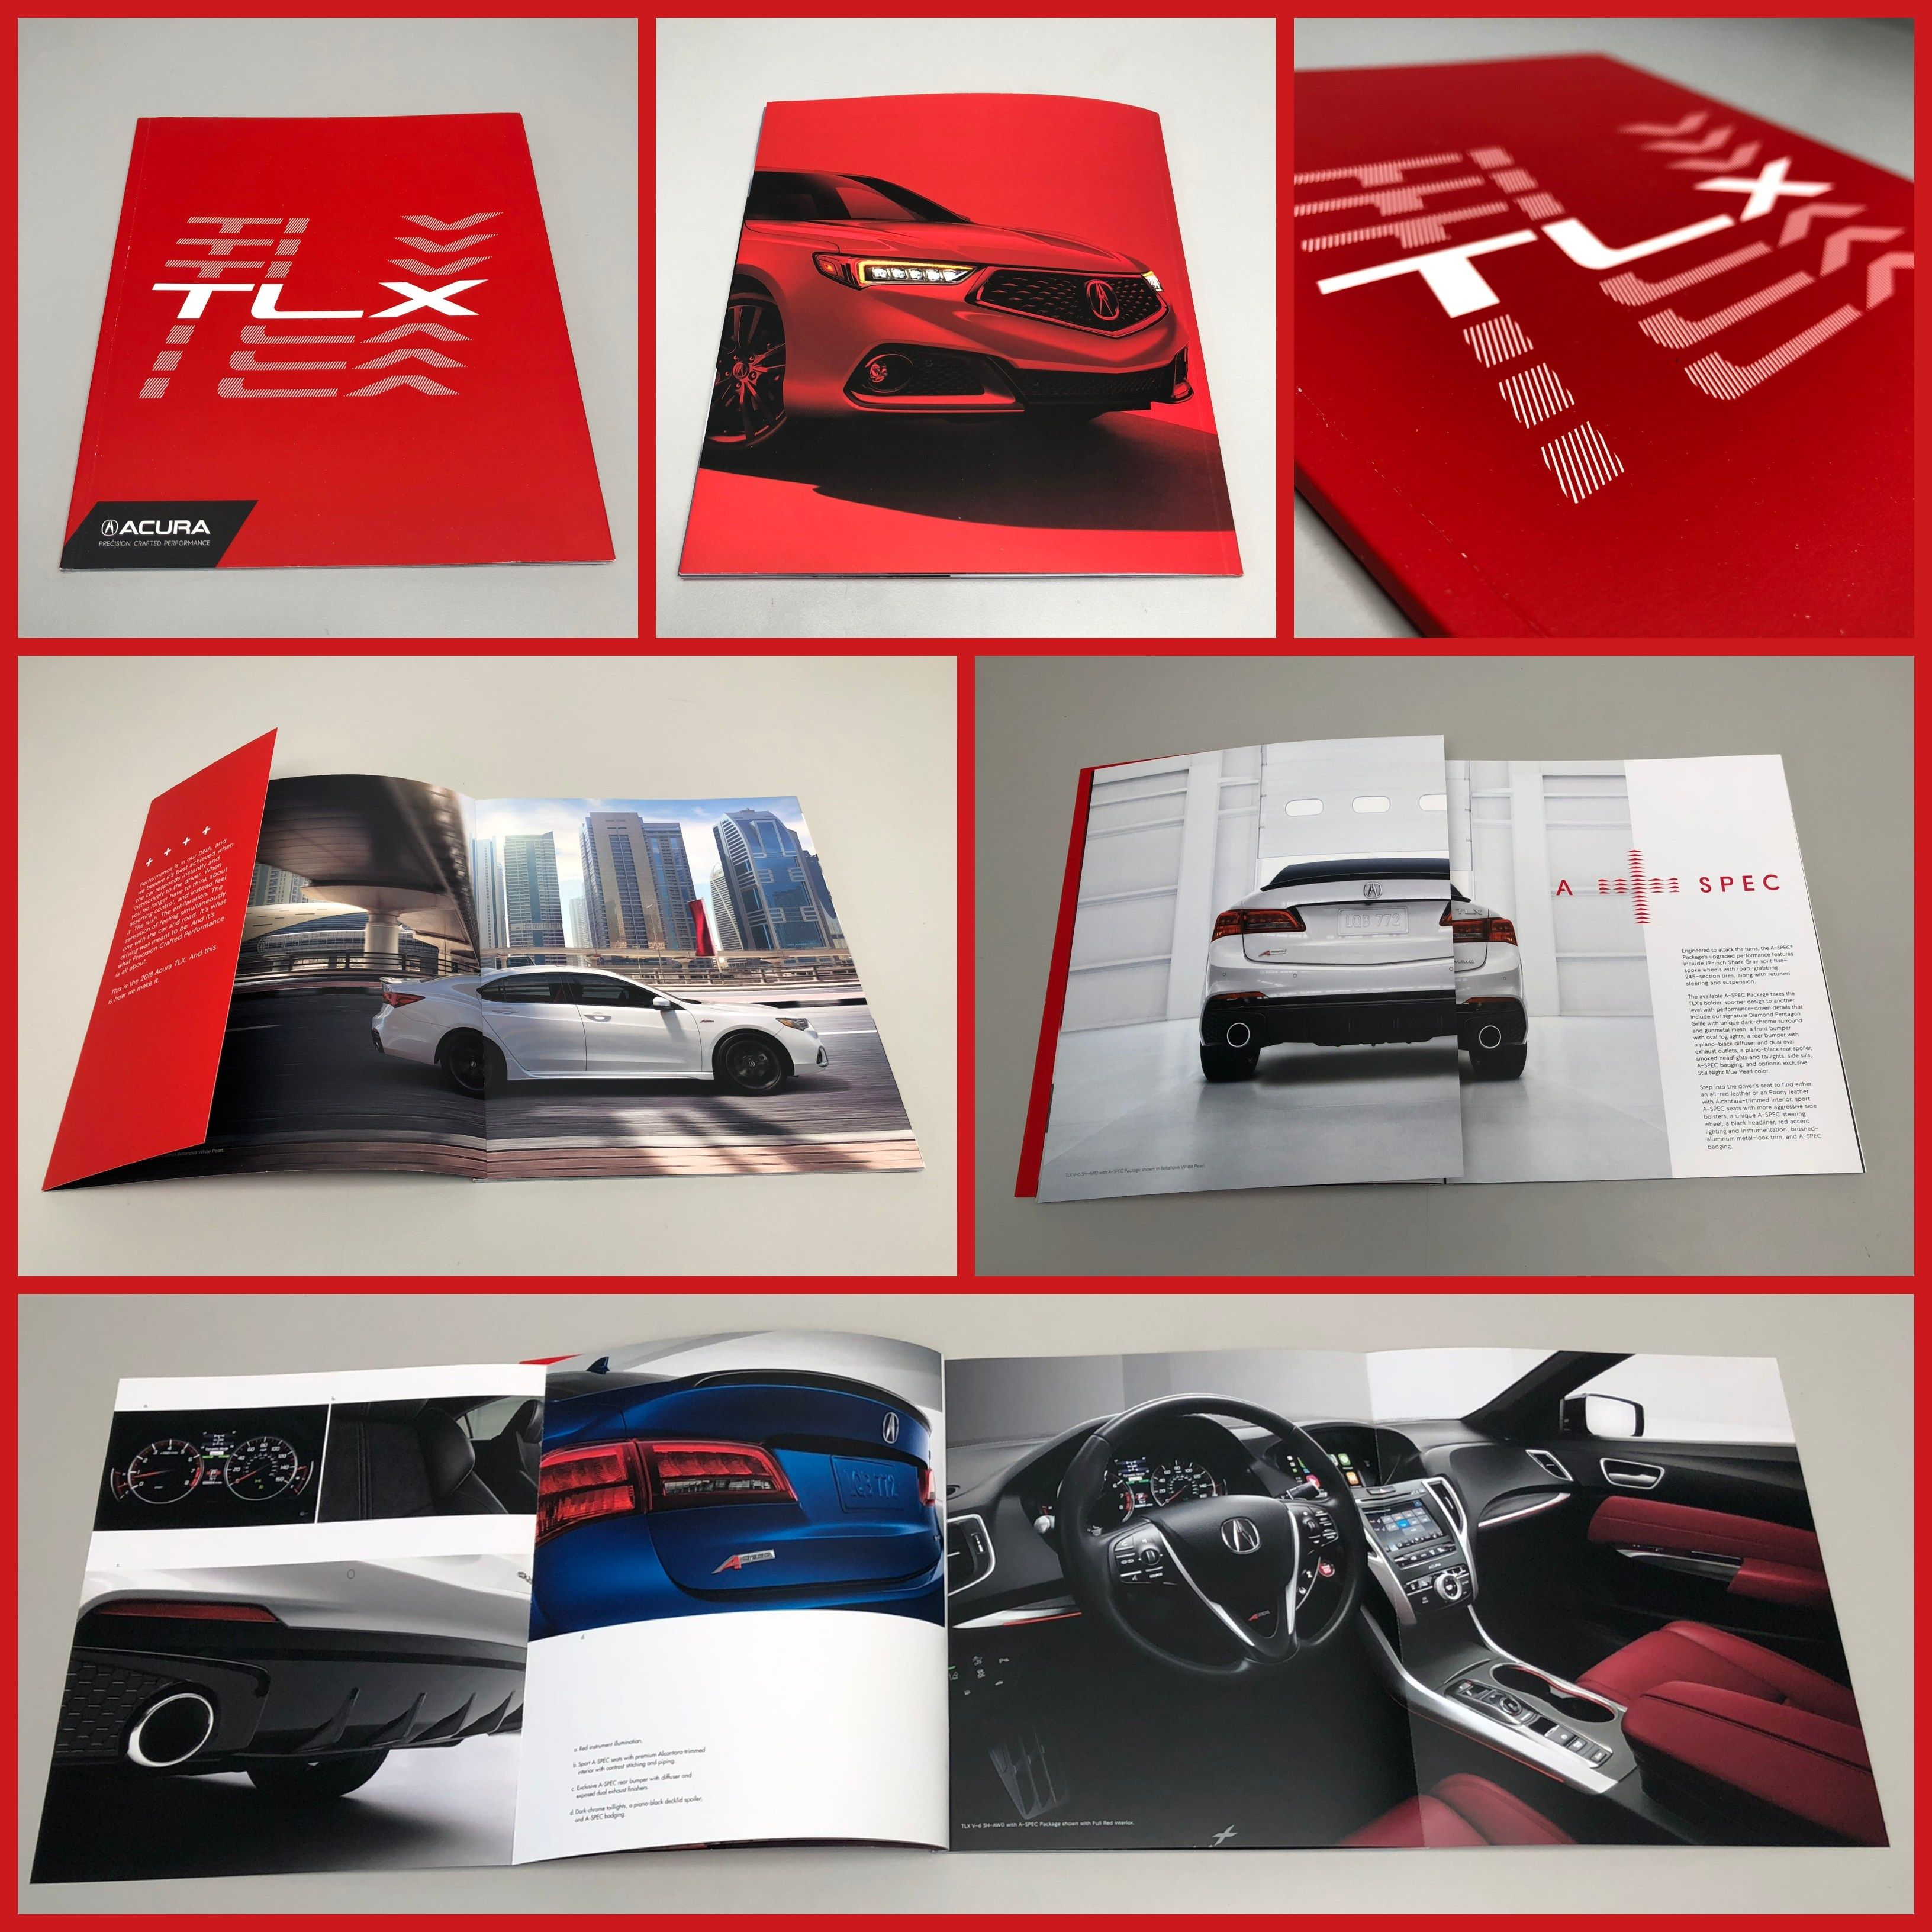 Acura Tlx, Acura, Brochure